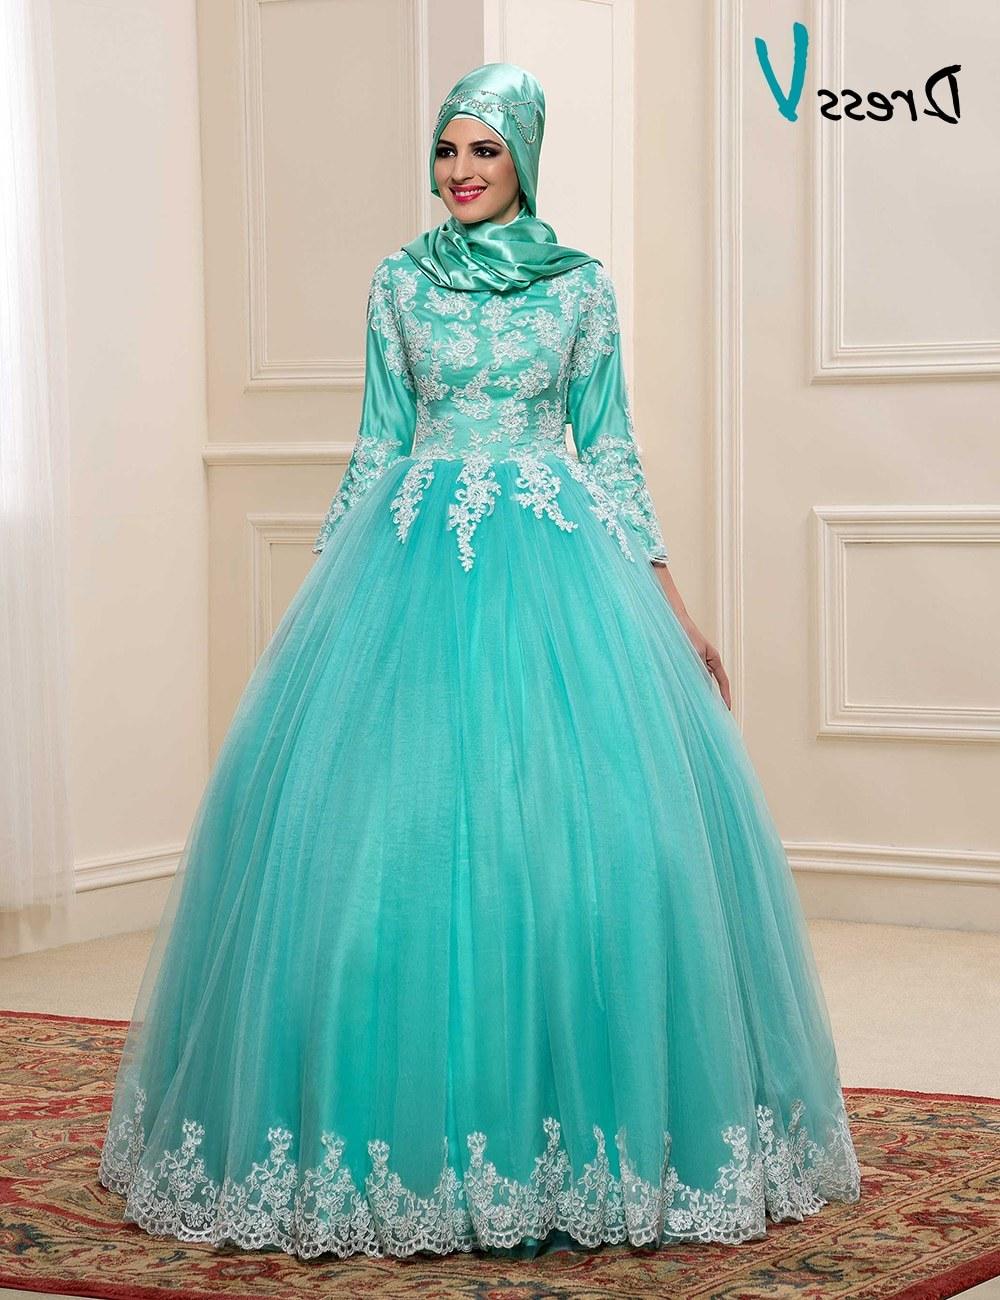 Bentuk Baju Pengantin Muslimah Modern 2014 Xtd6 islamic Hijab Wedding Dresses – Fashion Dresses